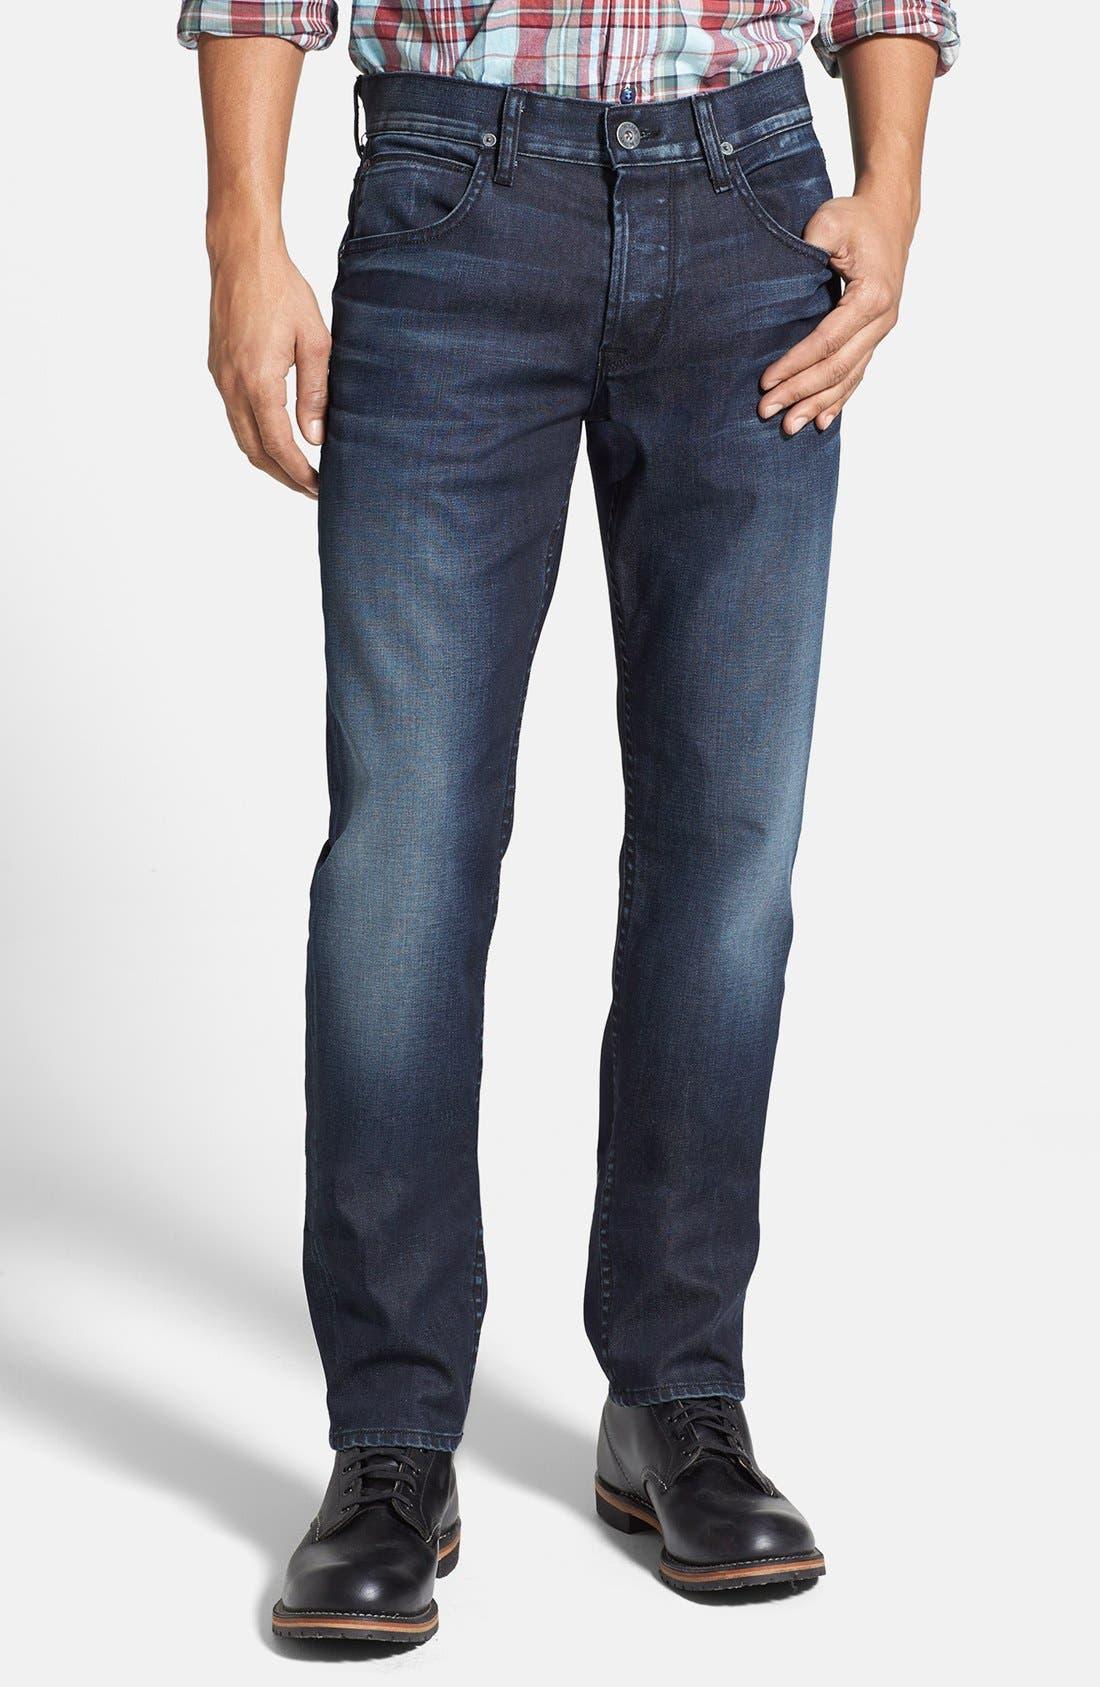 Alternate Image 1 Selected - Hudson Jeans 'Blake' Slim Straight Leg Jeans (Darkness)